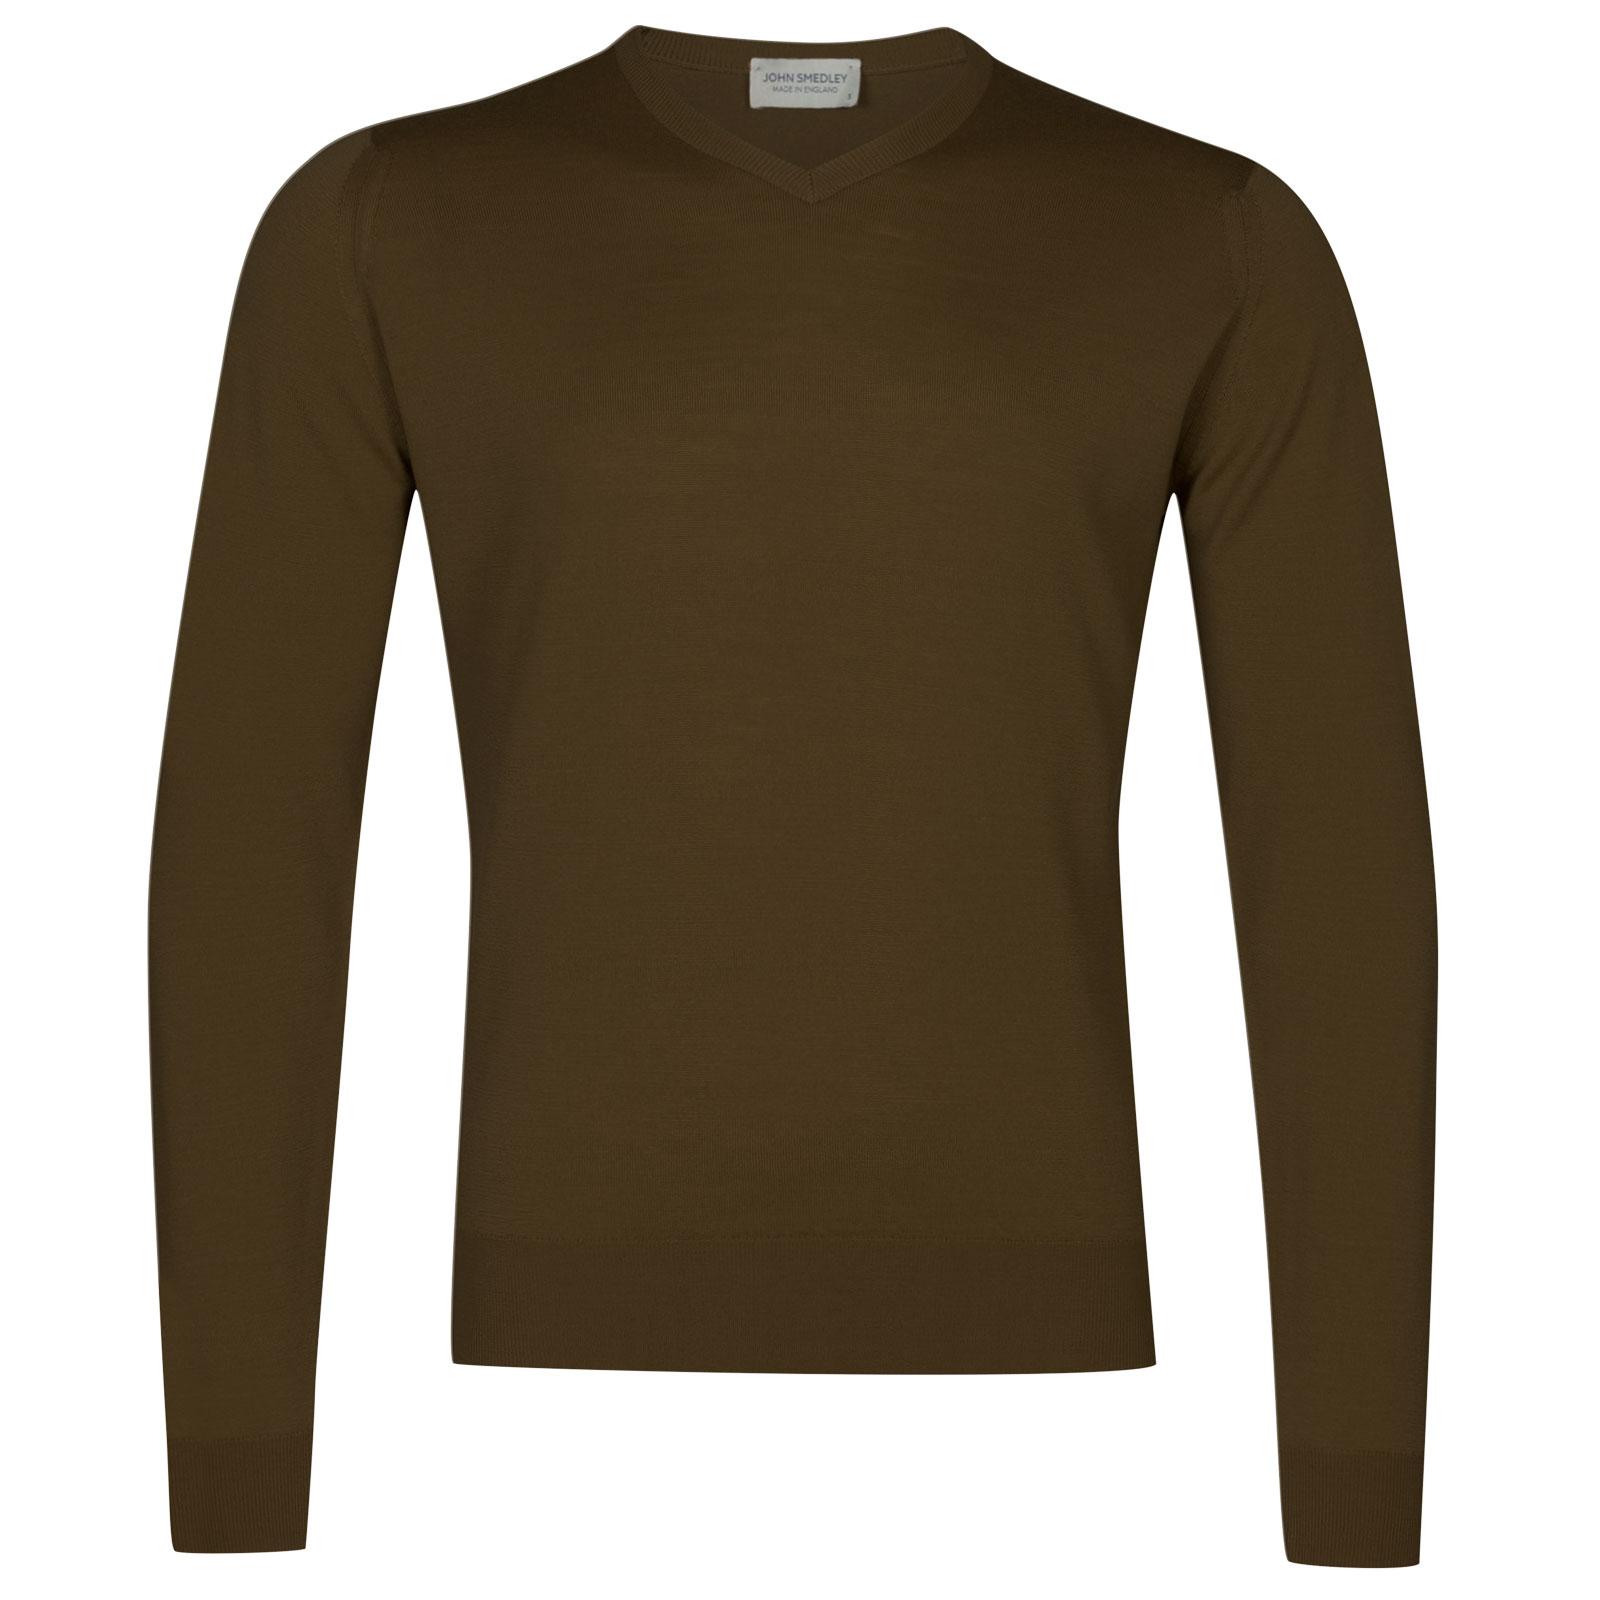 John Smedley genoa Merino Wool Pullover in Kielder Green-M